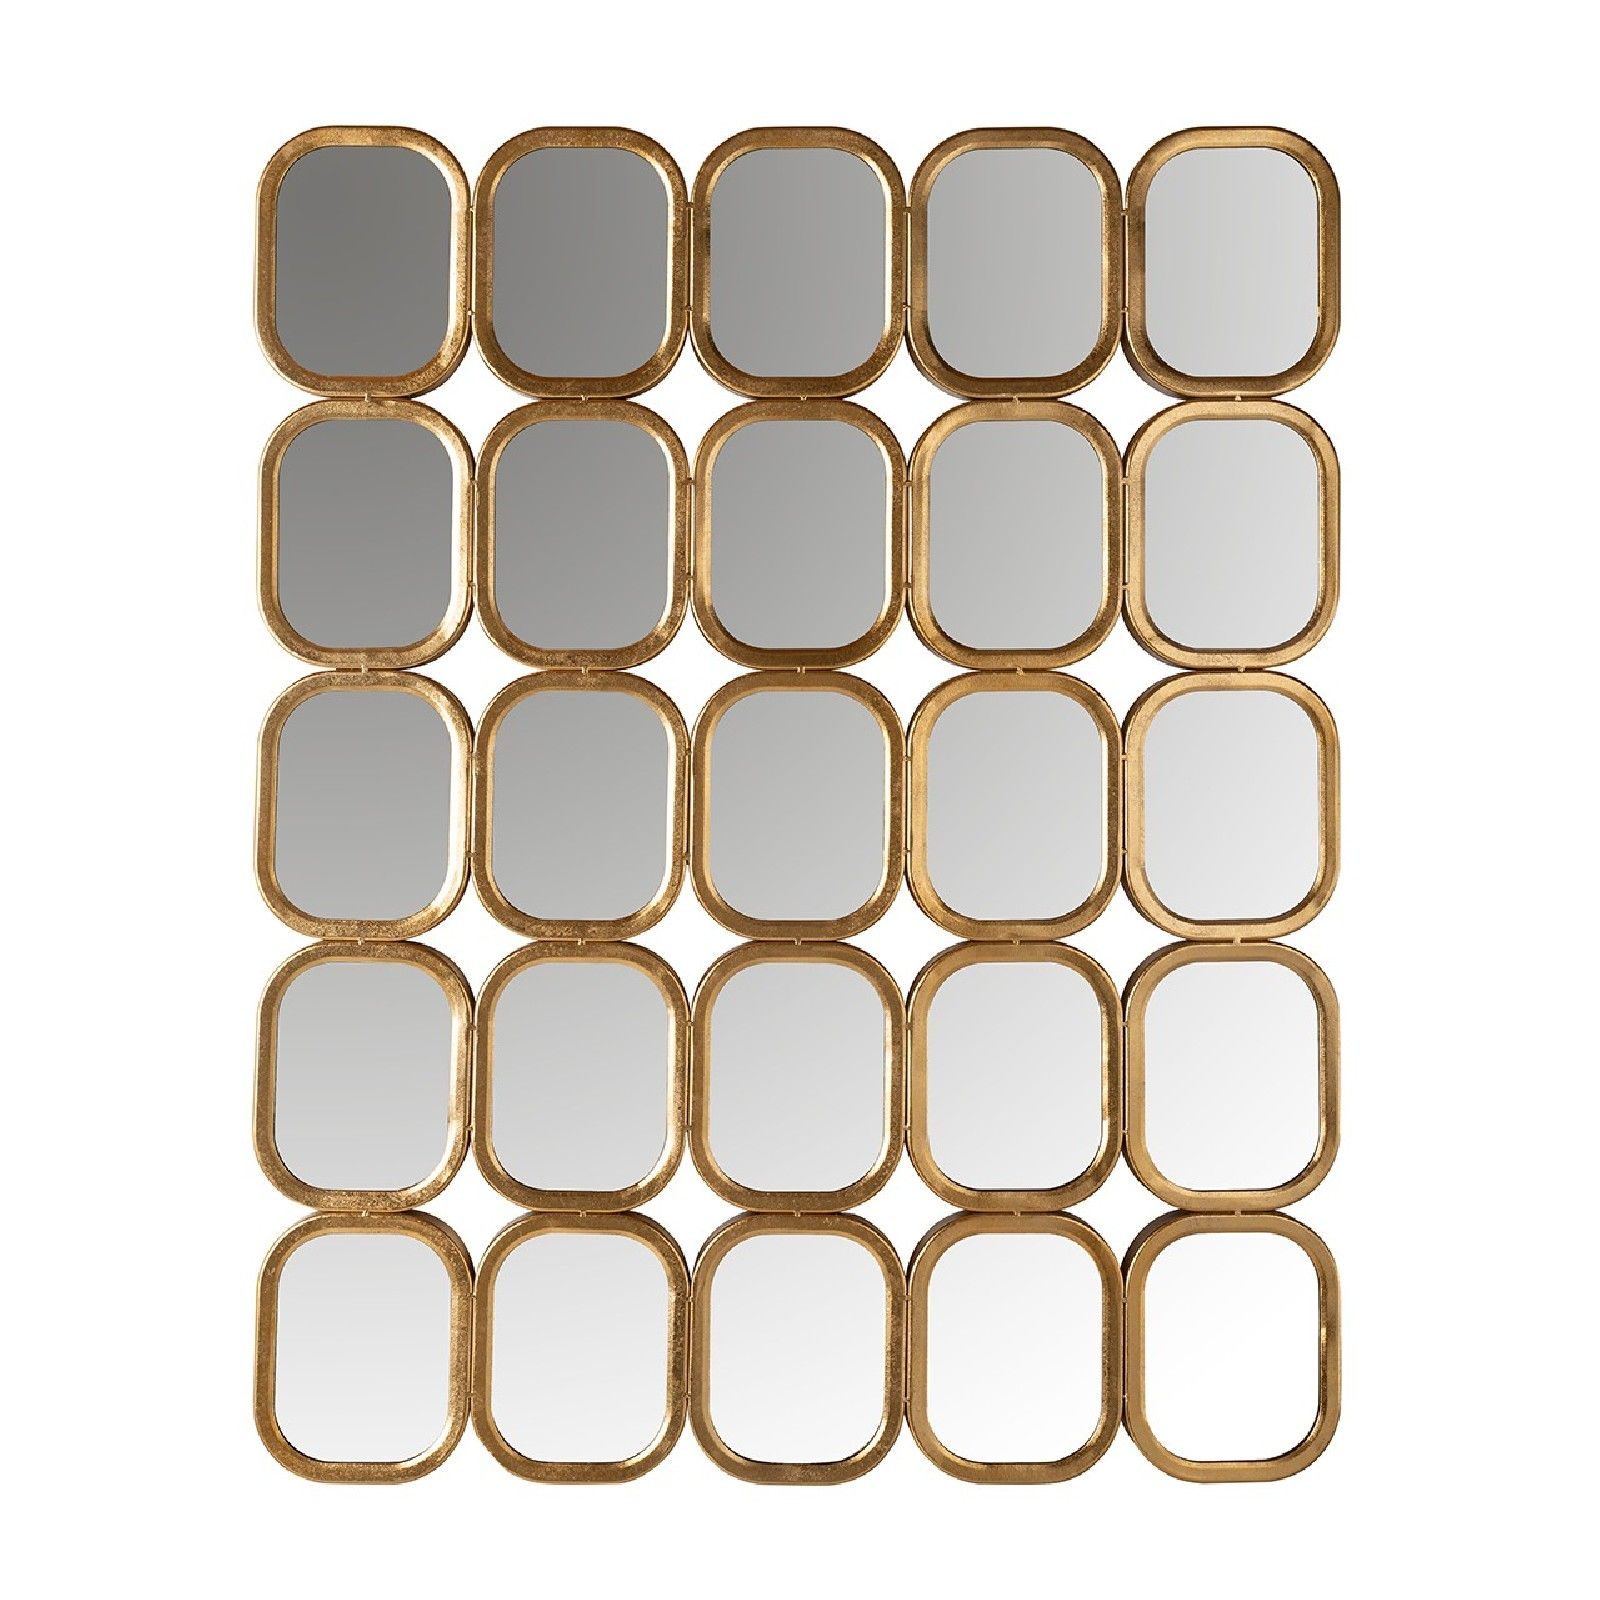 Miroir Marila avec 25 miroirs Miroirs décoratifs - 13